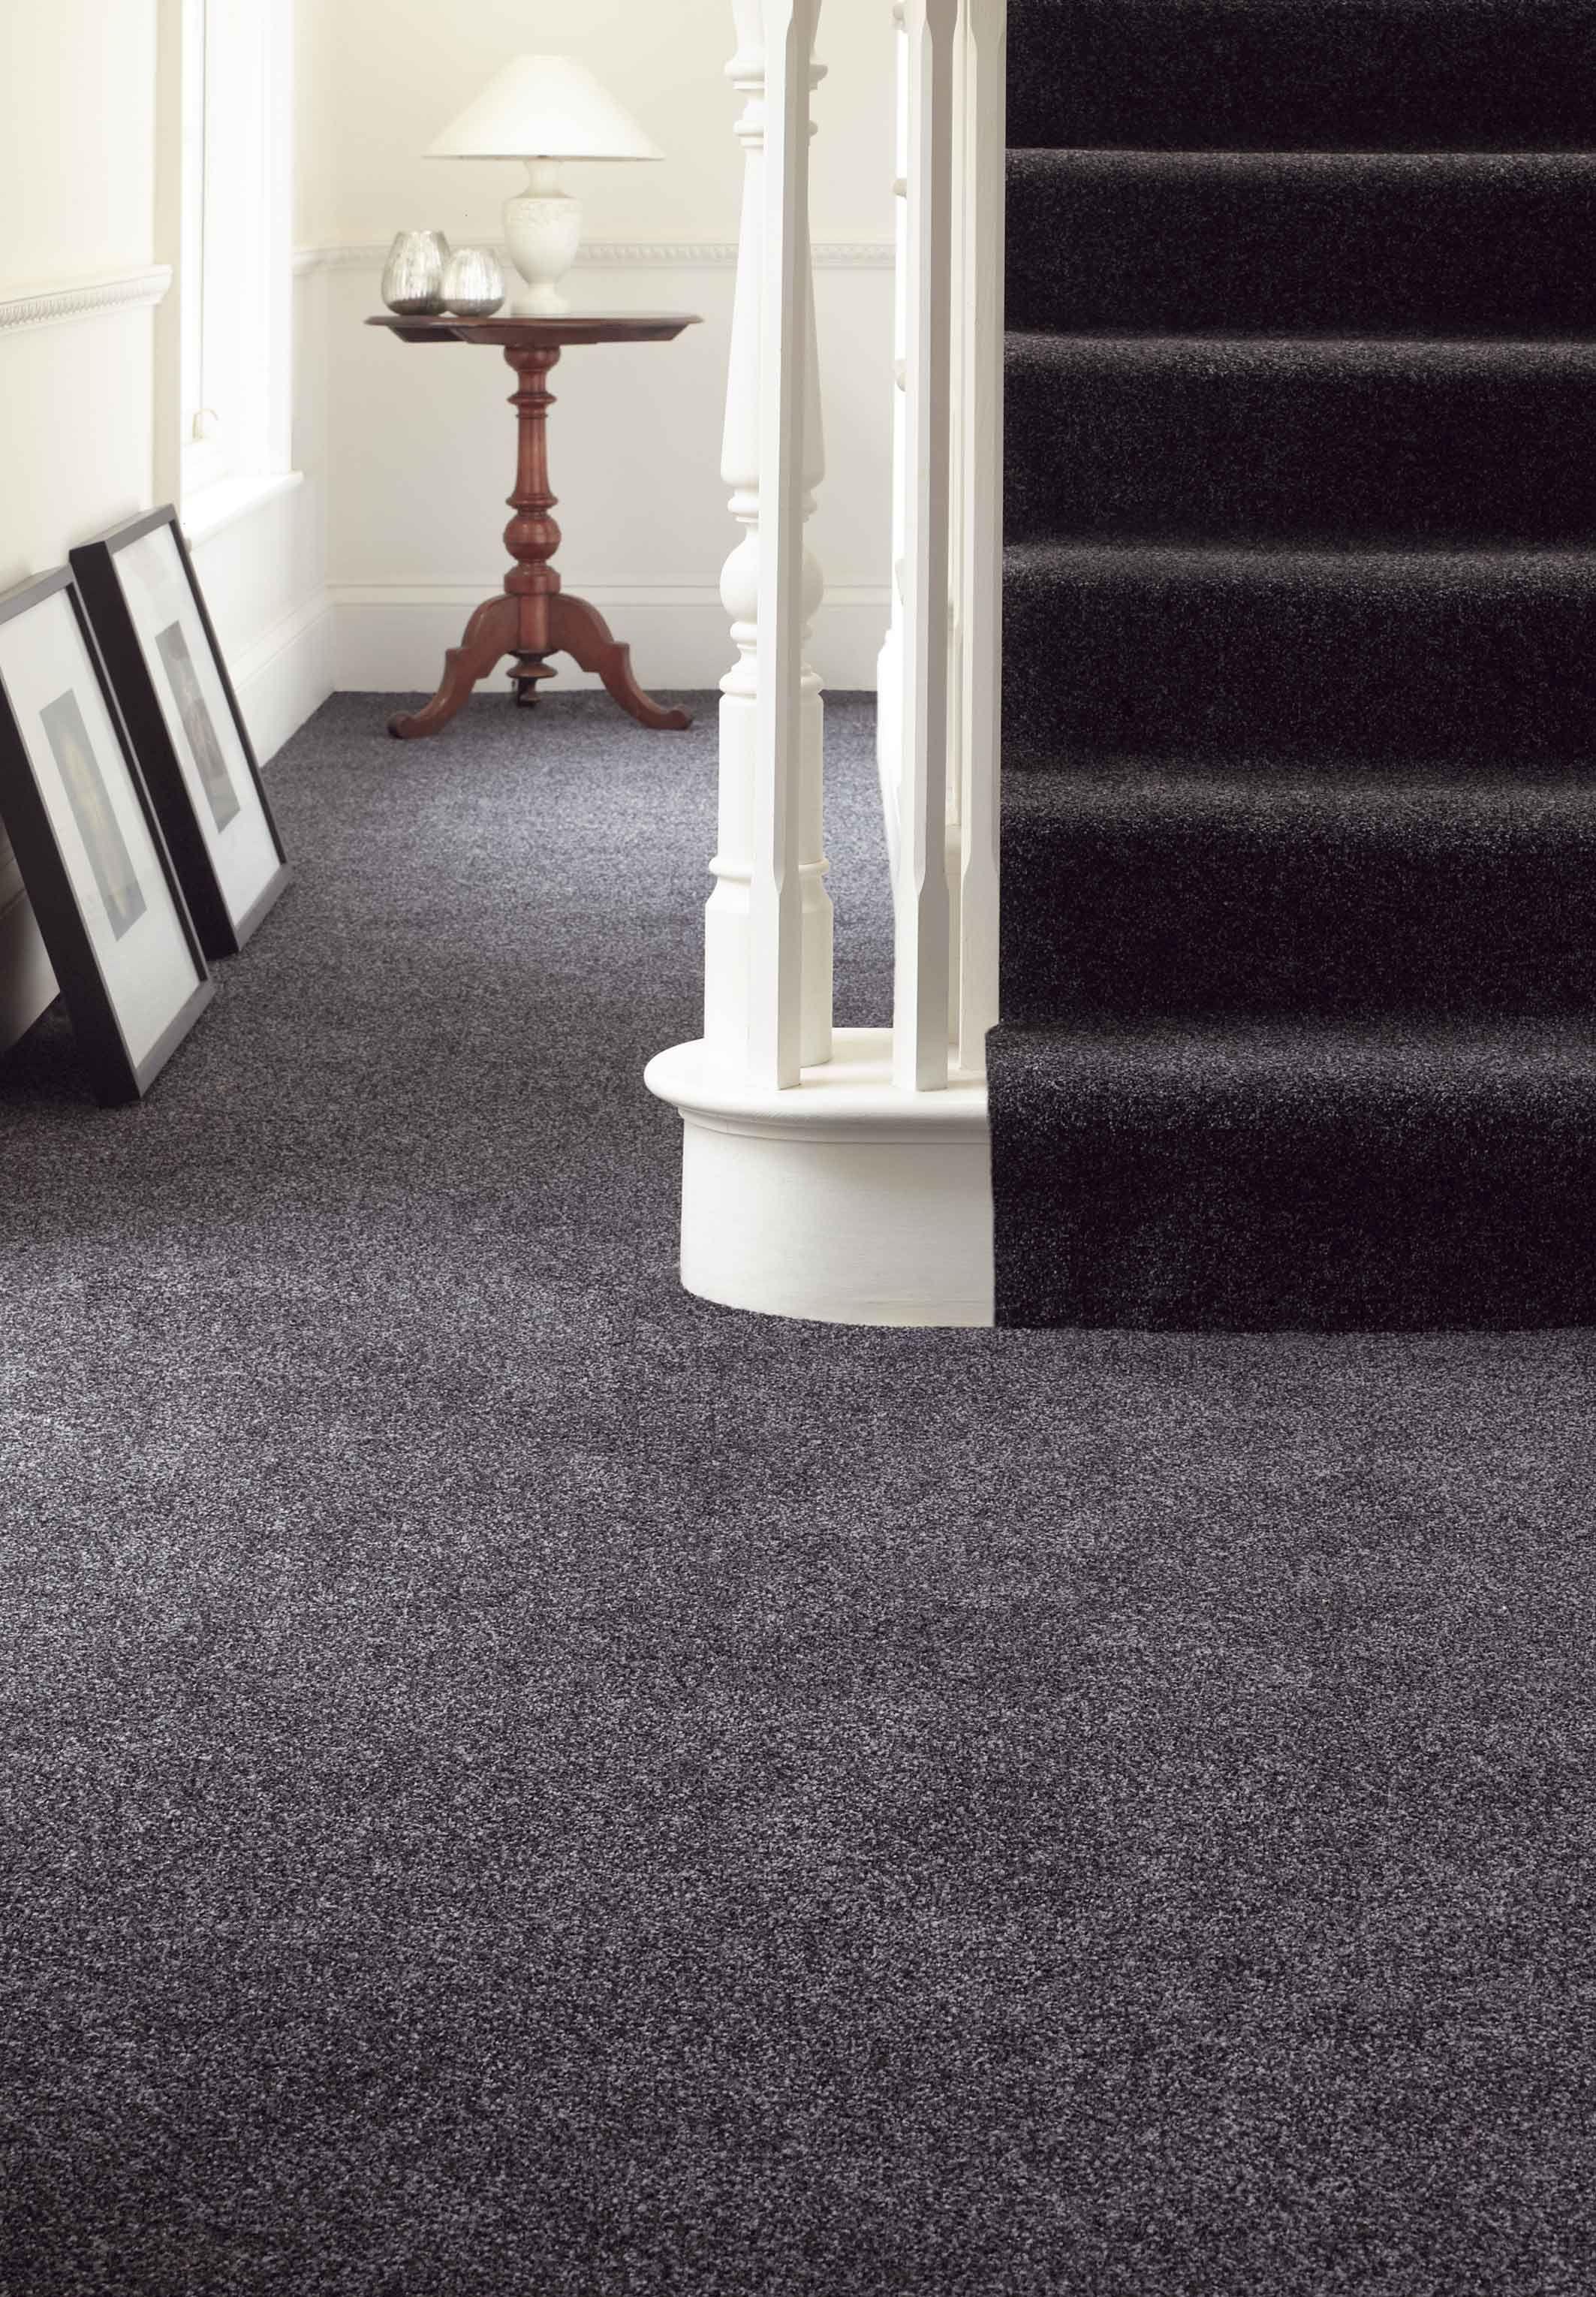 A Nice Warm Carpet Available At Www Beharcarpets Co Uk Carpet Colors Grey Carpet Buying Carpet